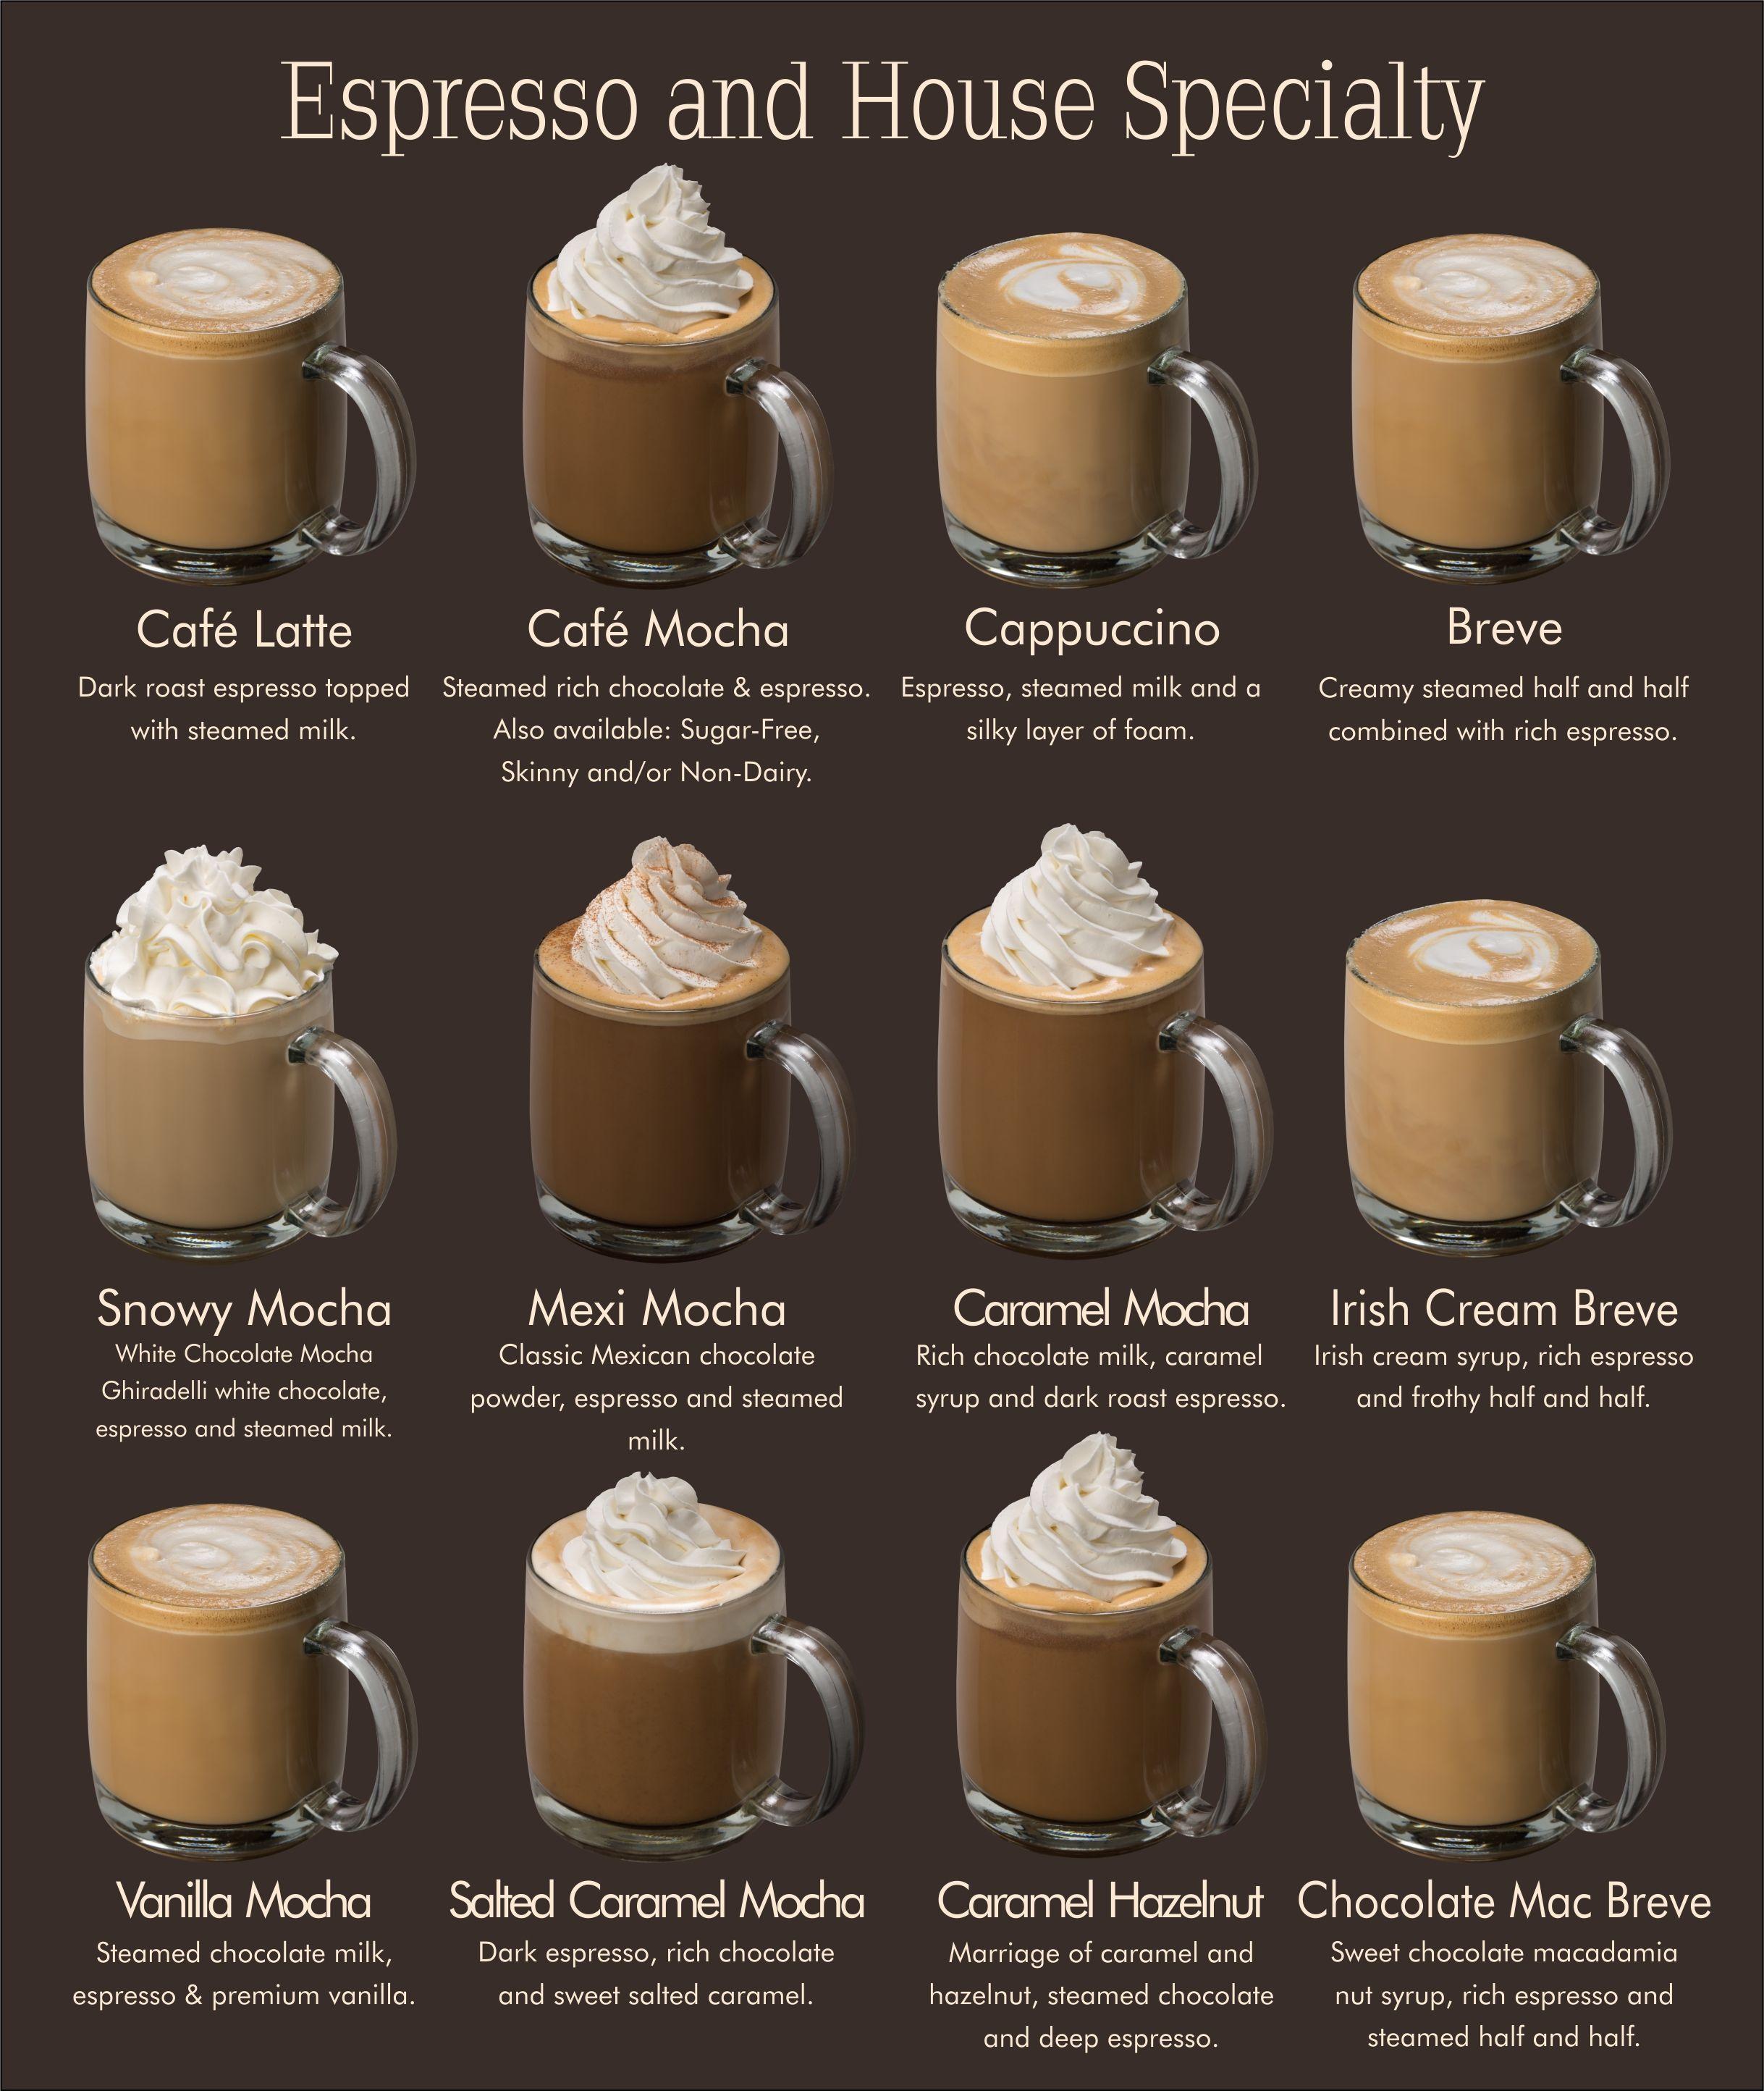 Drink Menu In 2020 Coffee Drink Recipes Coffee Recipes Specialty Coffee Drinks